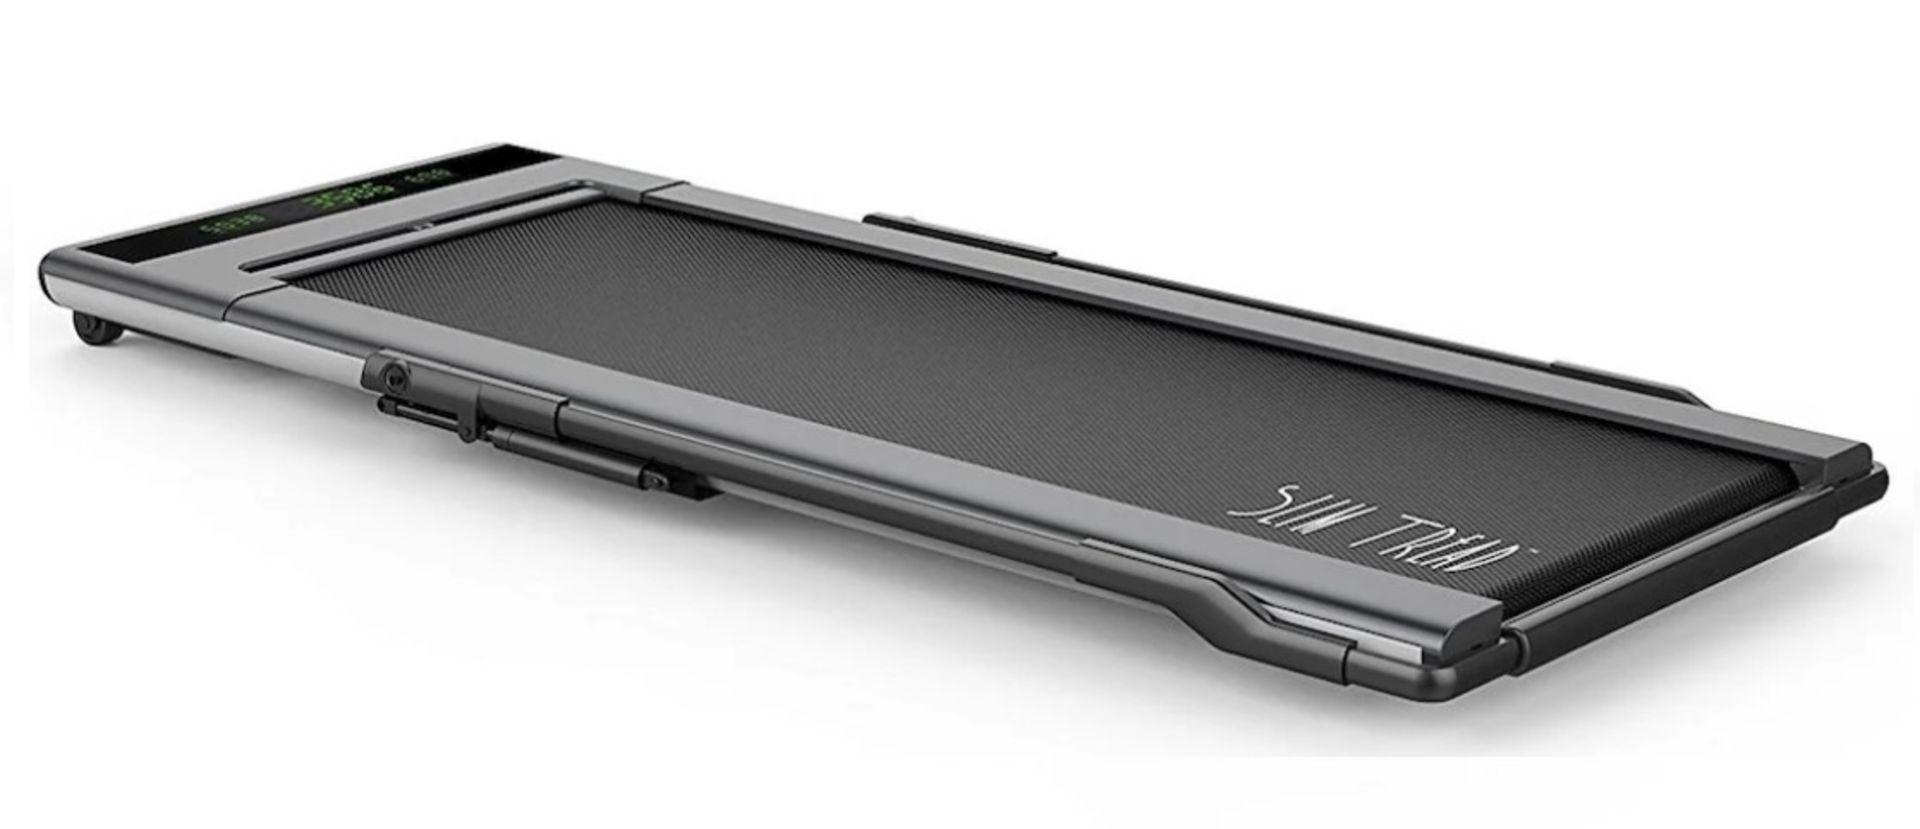 10 x Slim Tread Ultra Thin Smart Treadmill Running Machine - Brand New Sealed Stock - RRP £799 Each! - Image 10 of 24